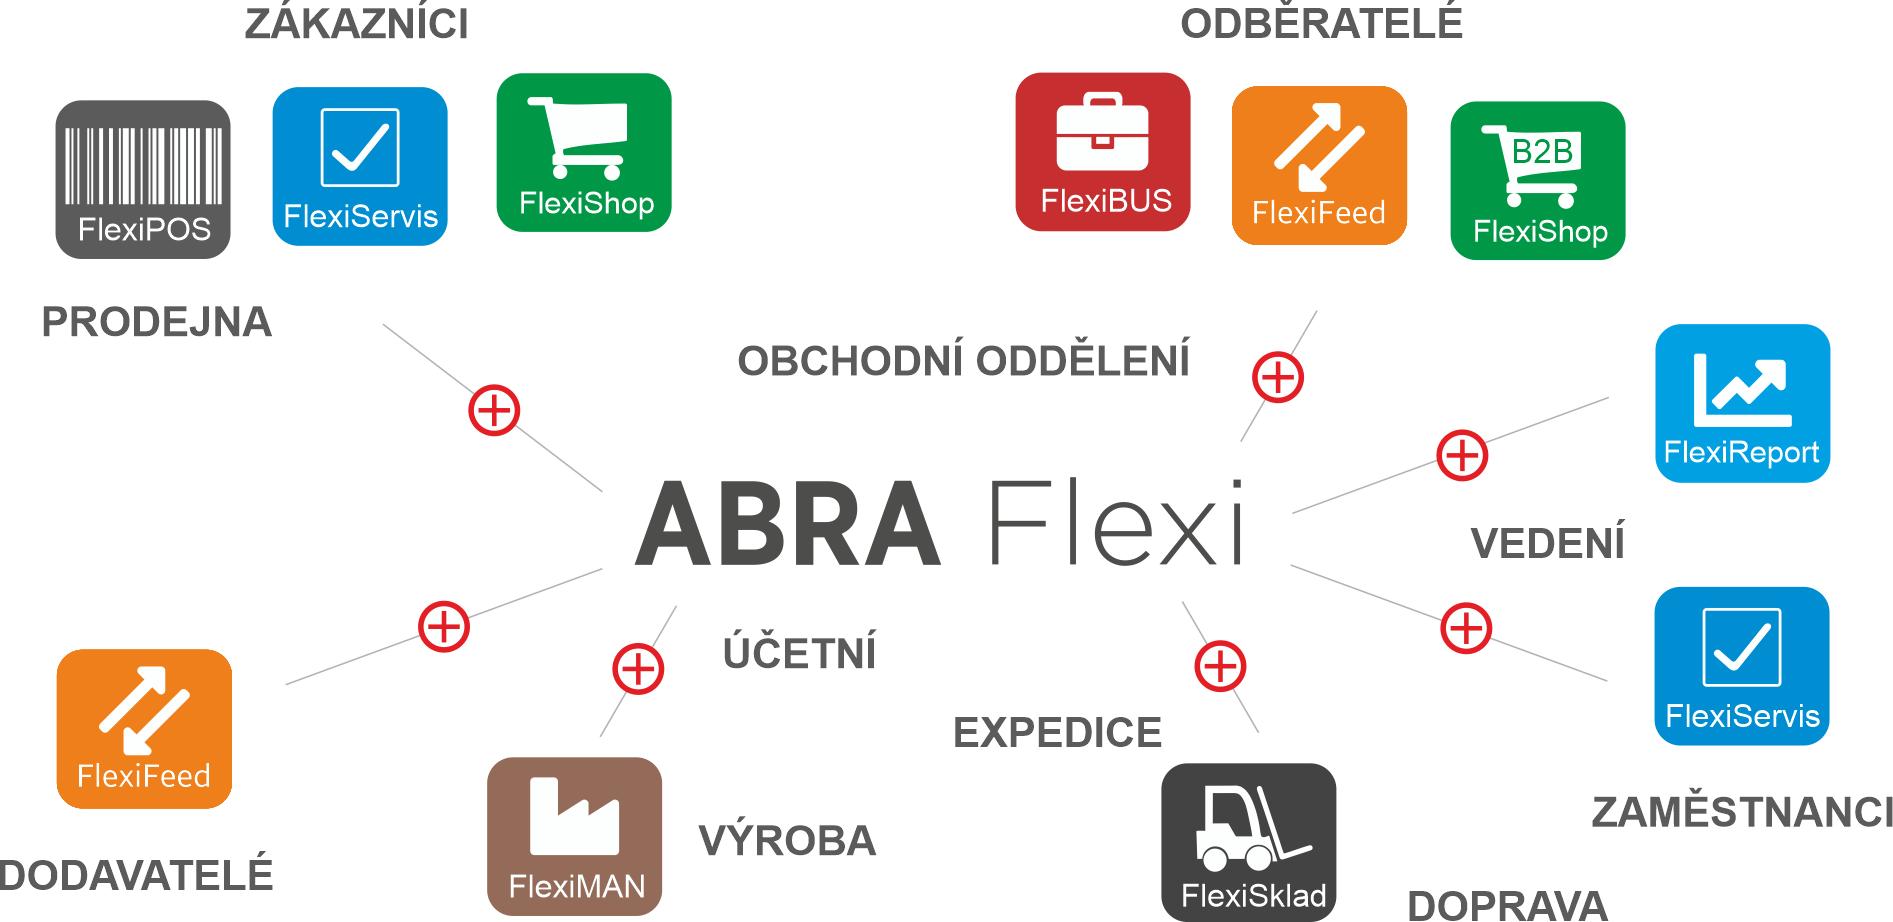 abra flexi+